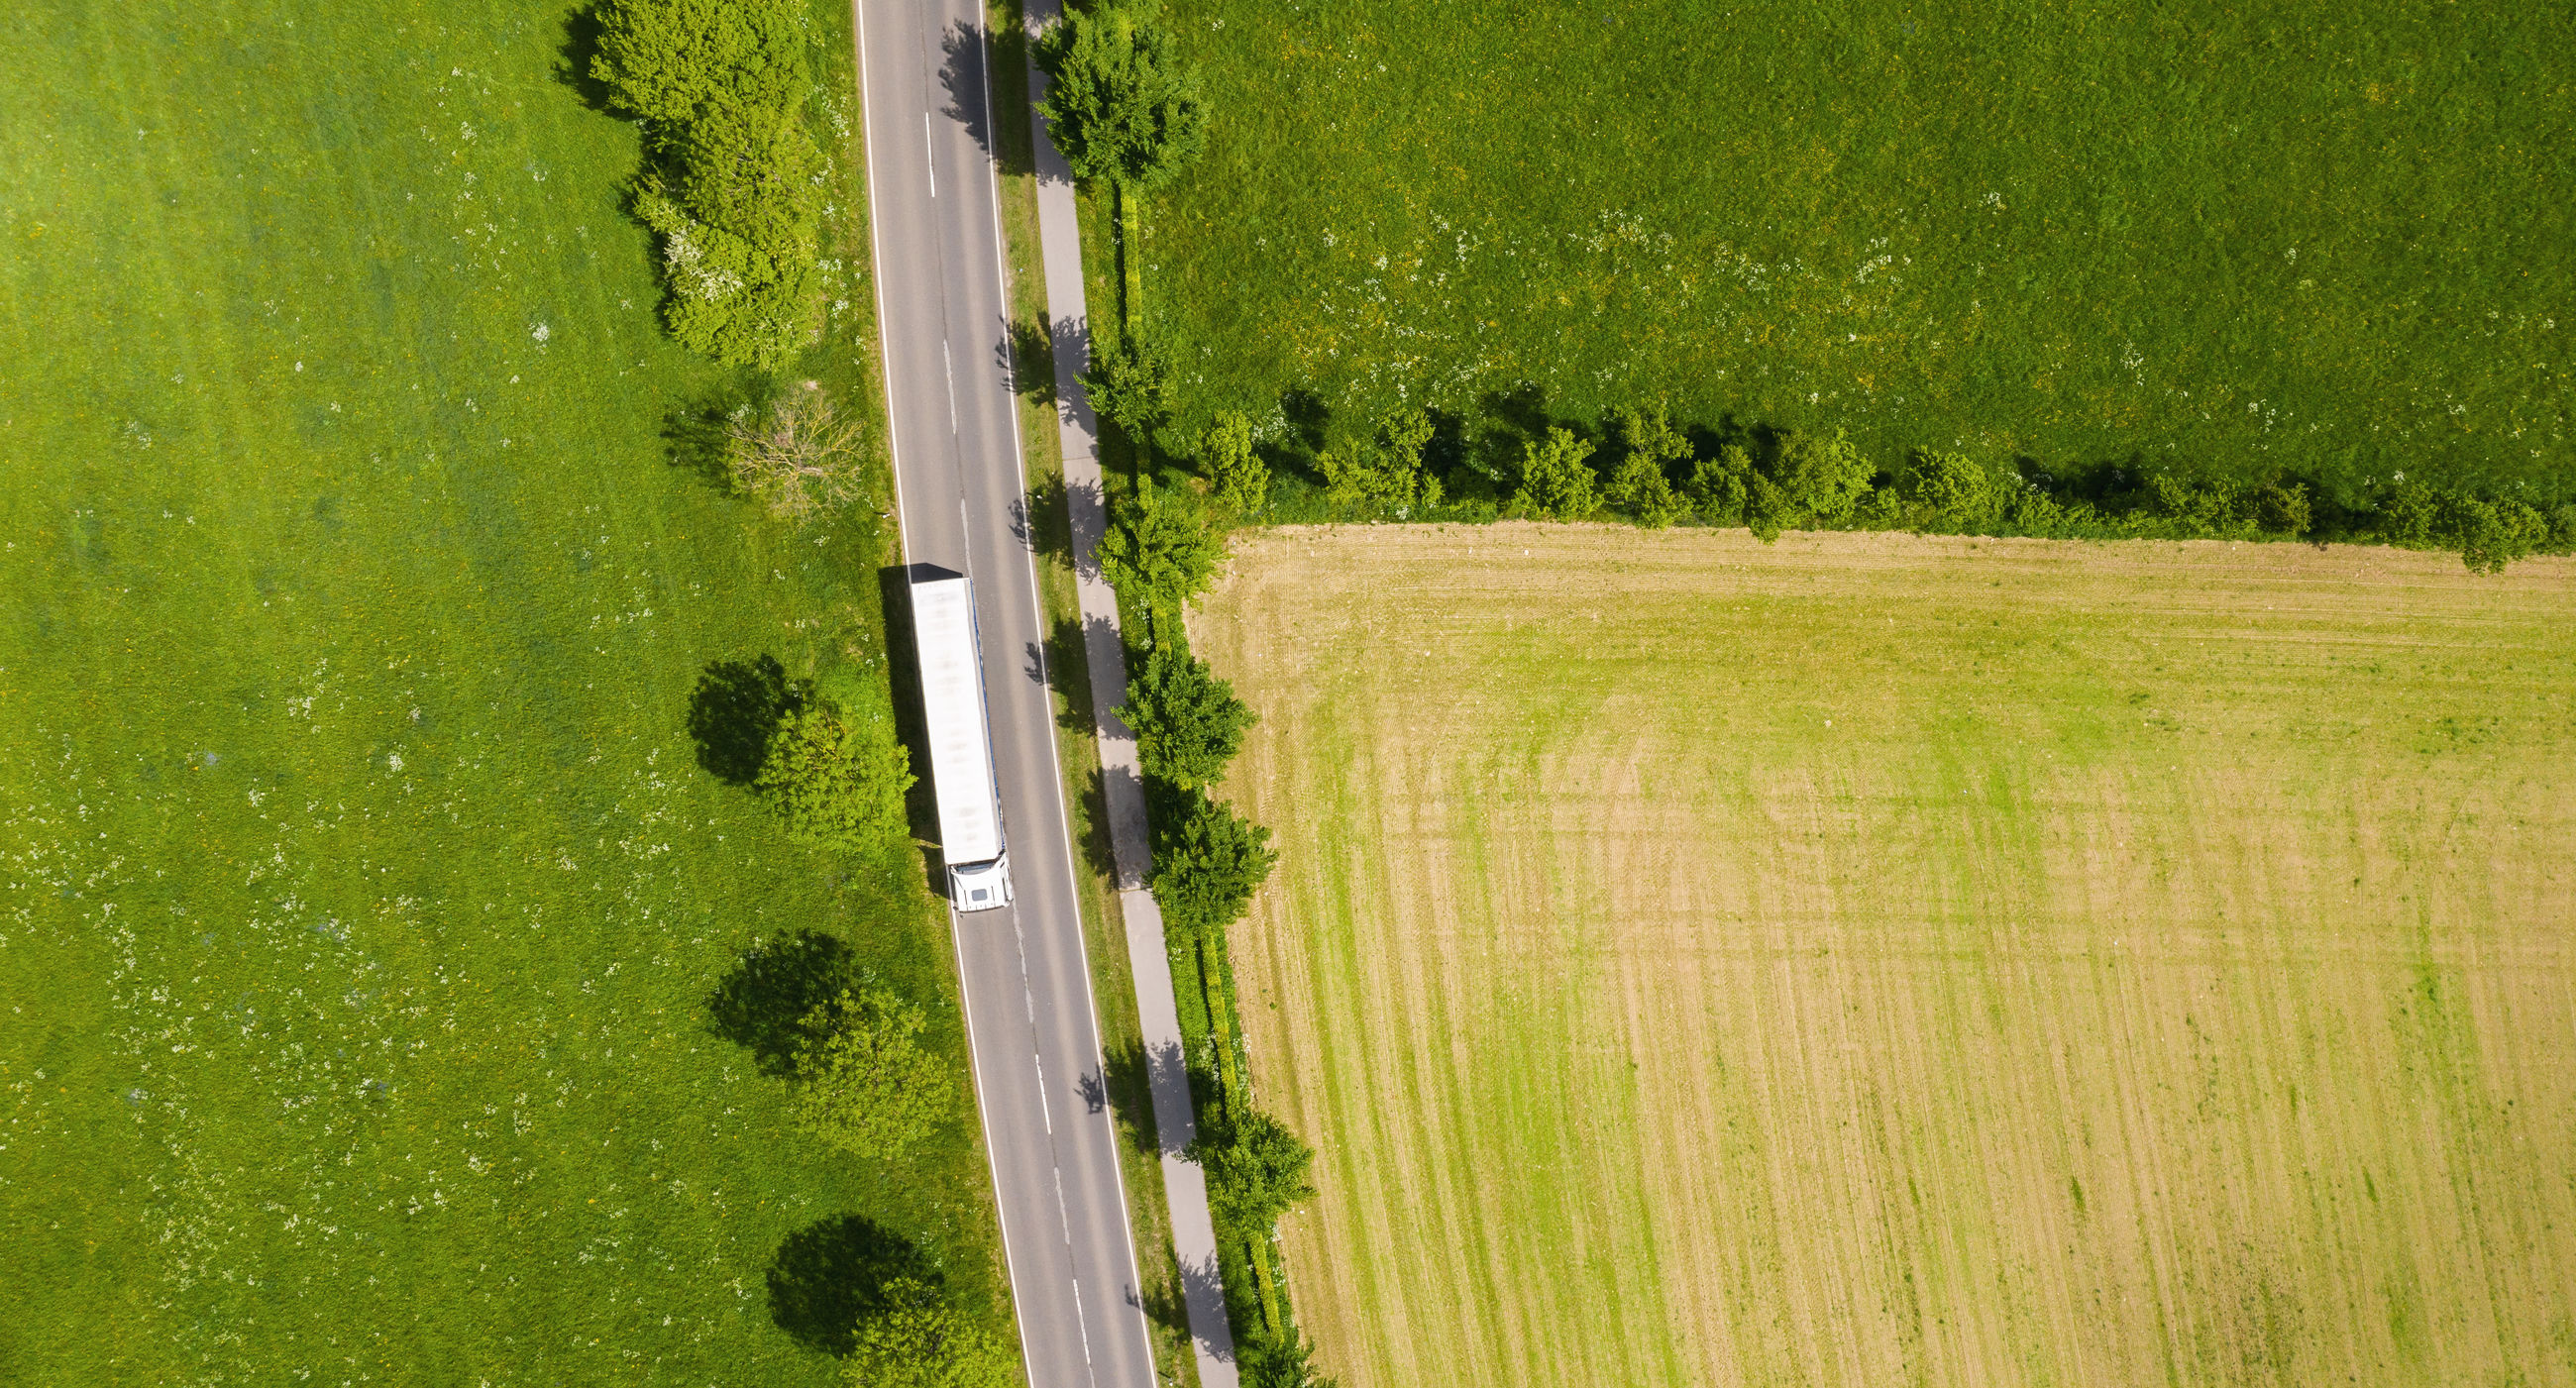 Aerial view of road amidst farm